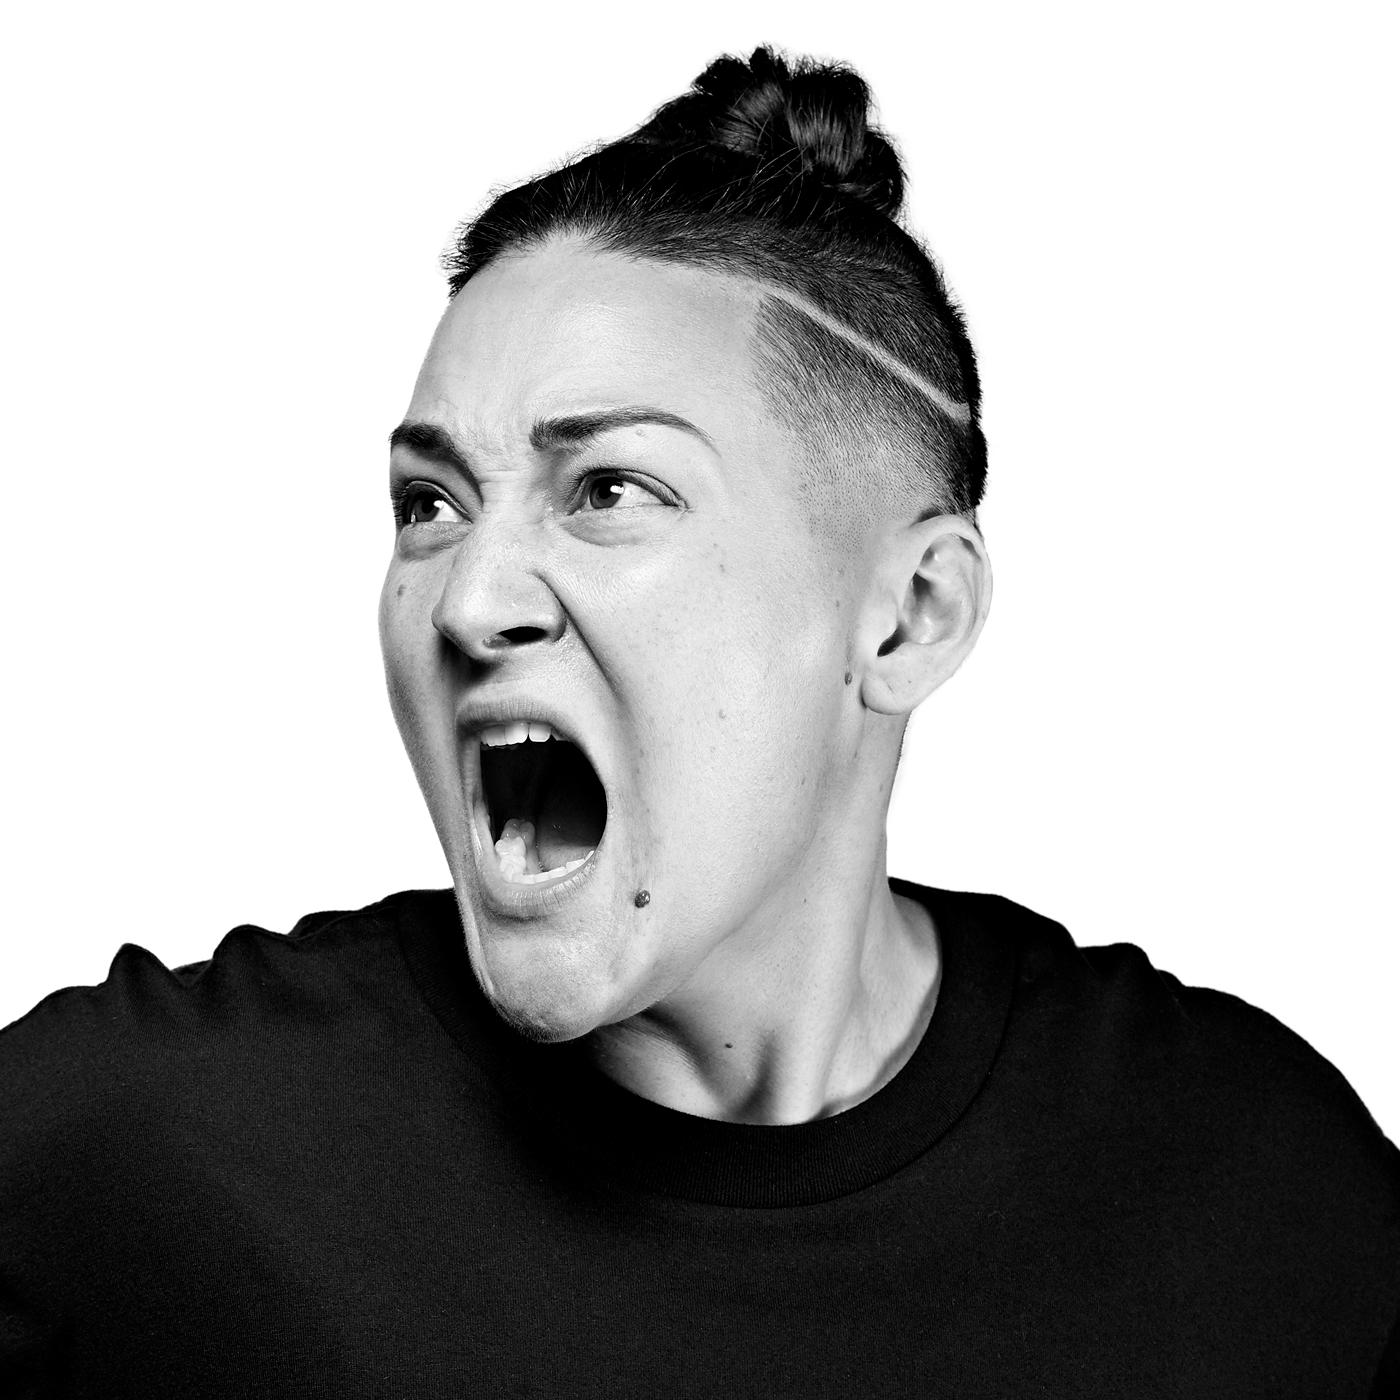 Teiya Kasahara strikes a theatrical pose in this black and white image